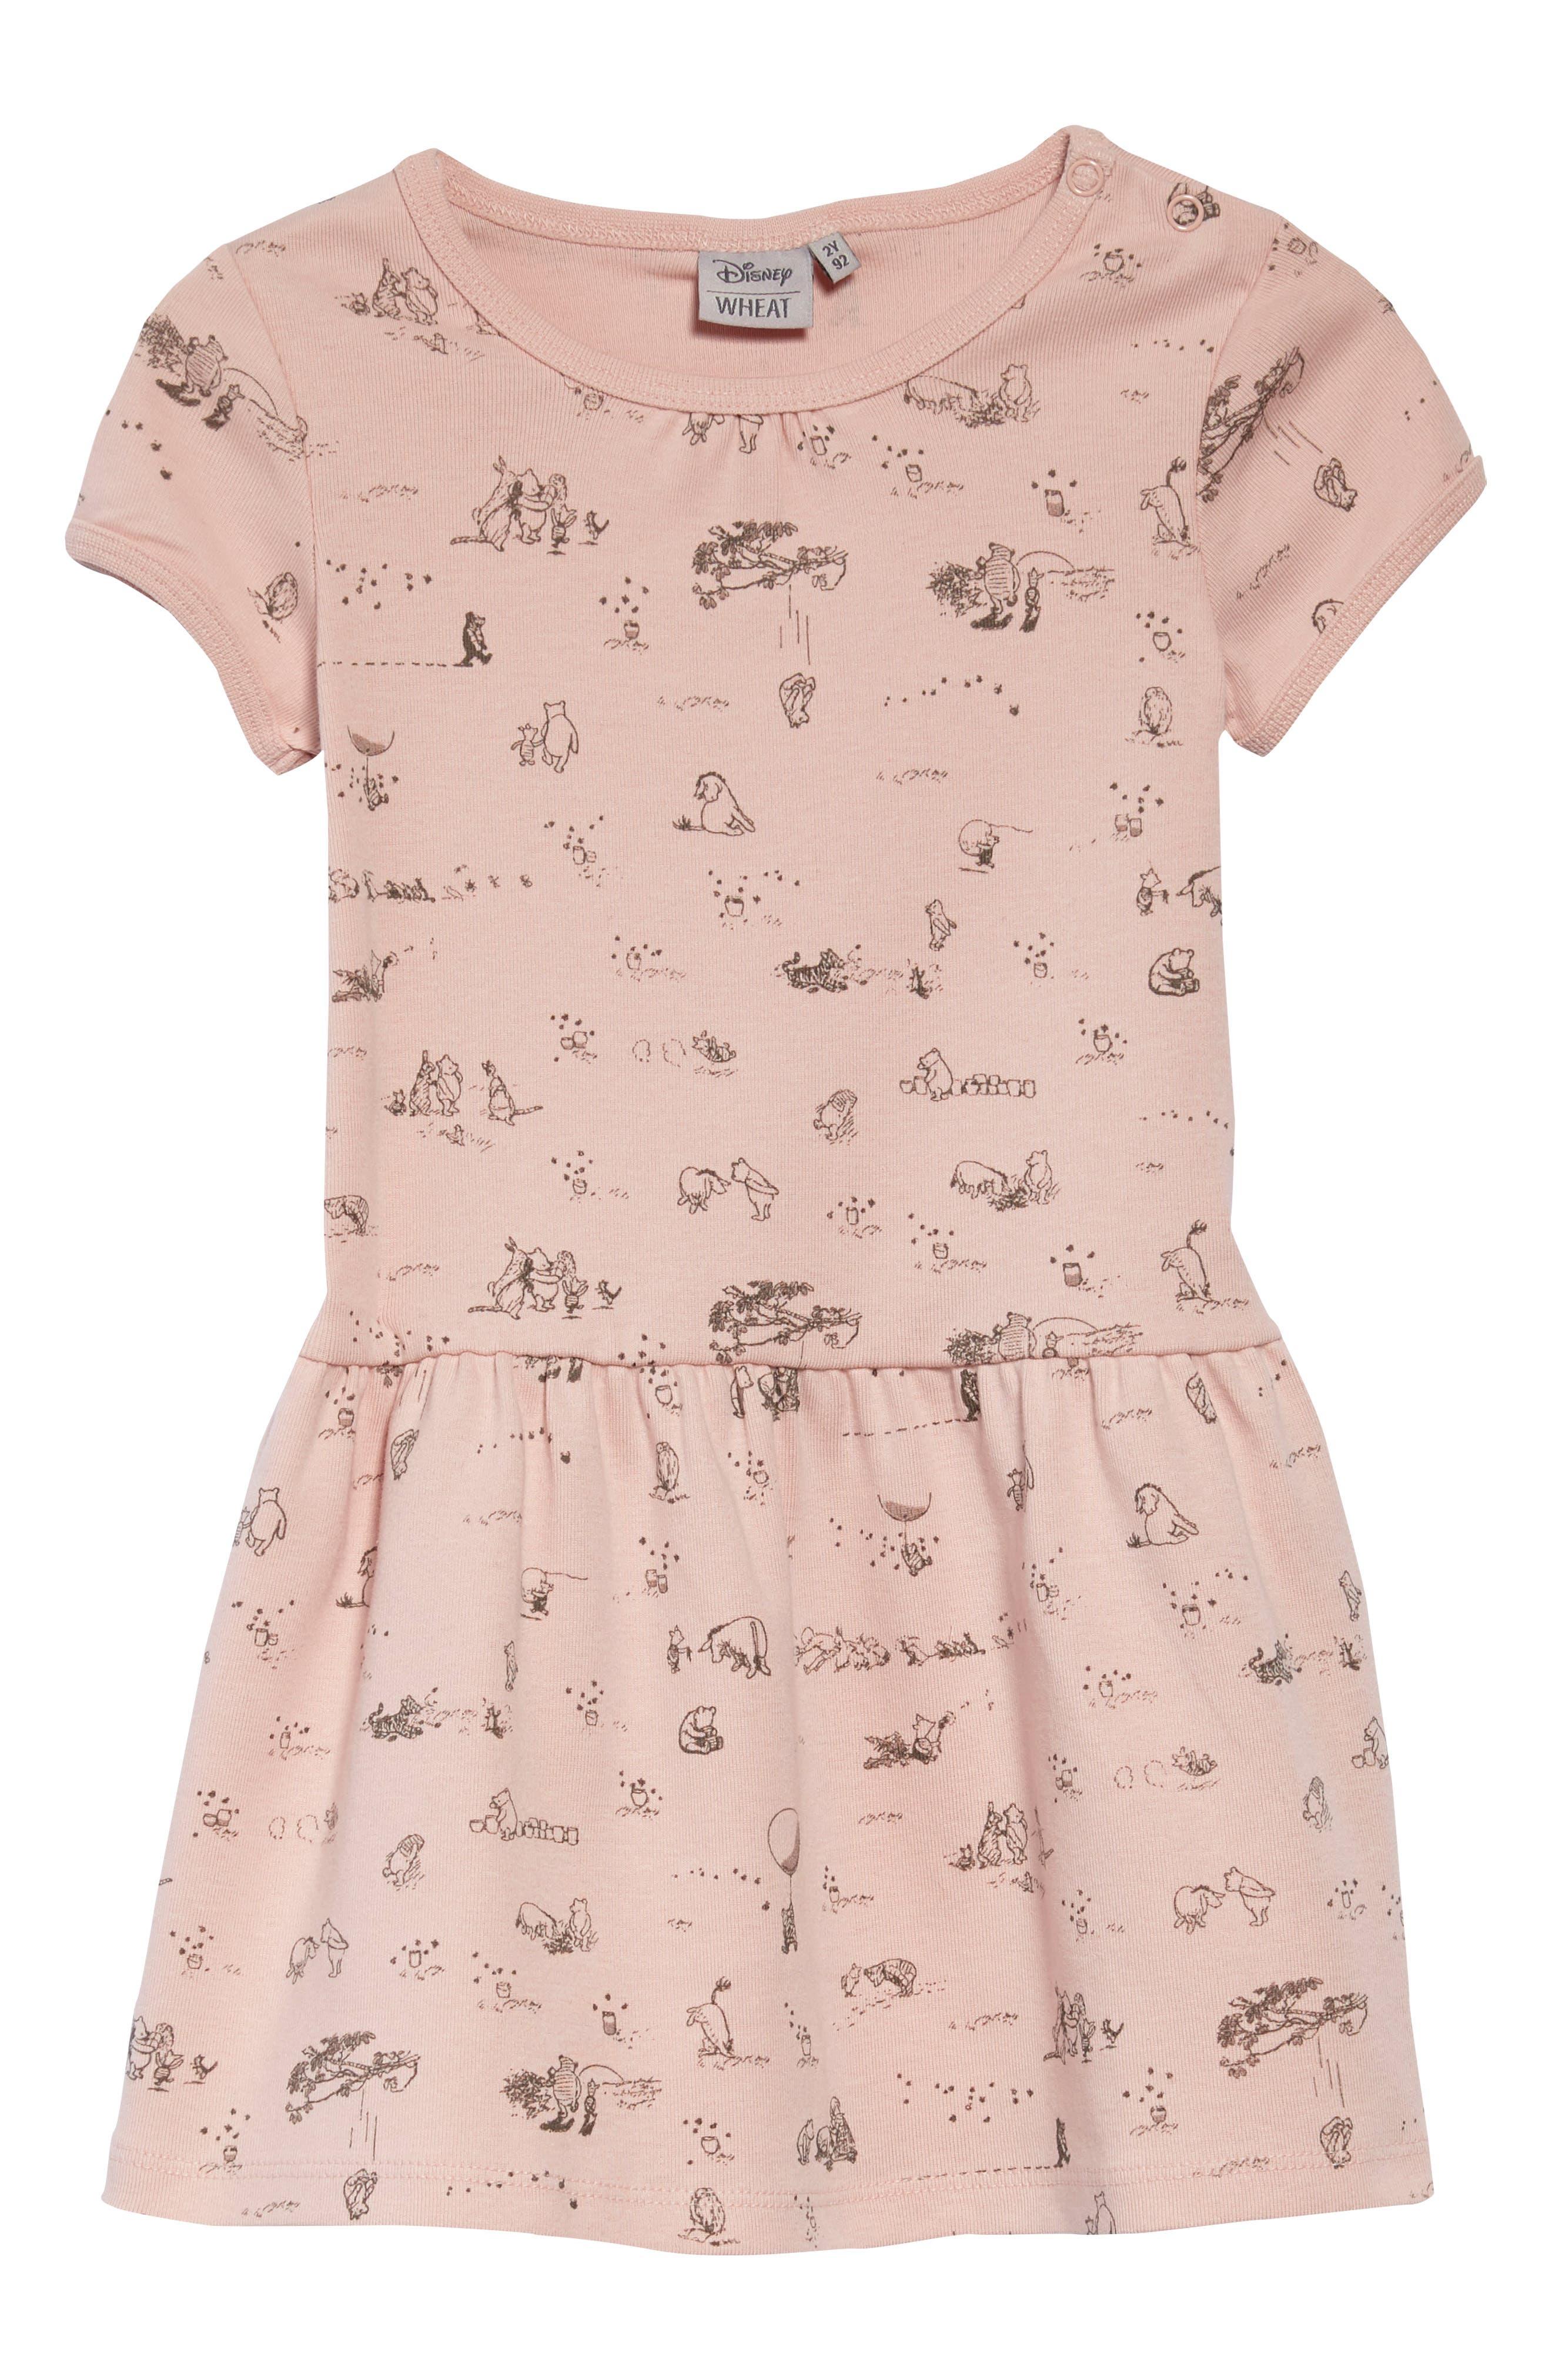 x Disney<sup>®</sup> Winnie the Pooh Print Dress,                             Main thumbnail 1, color,                             Powder